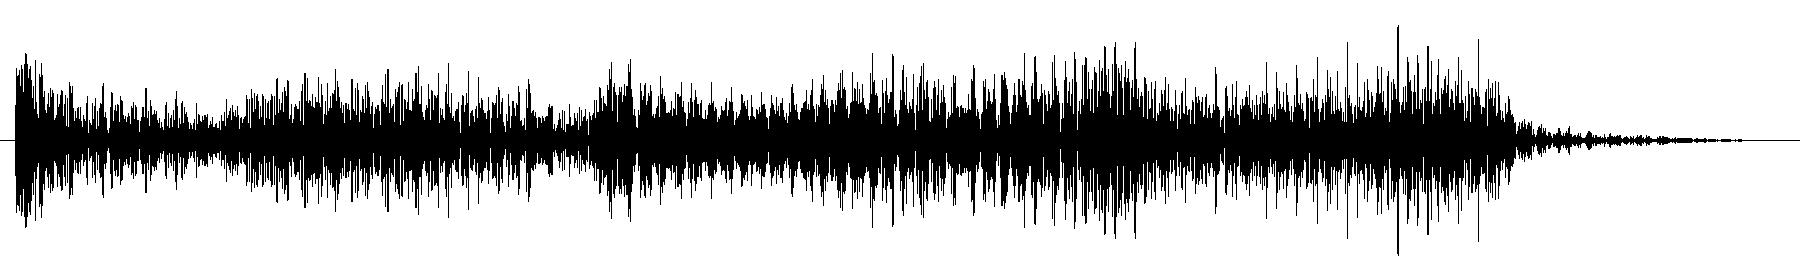 vocal 04